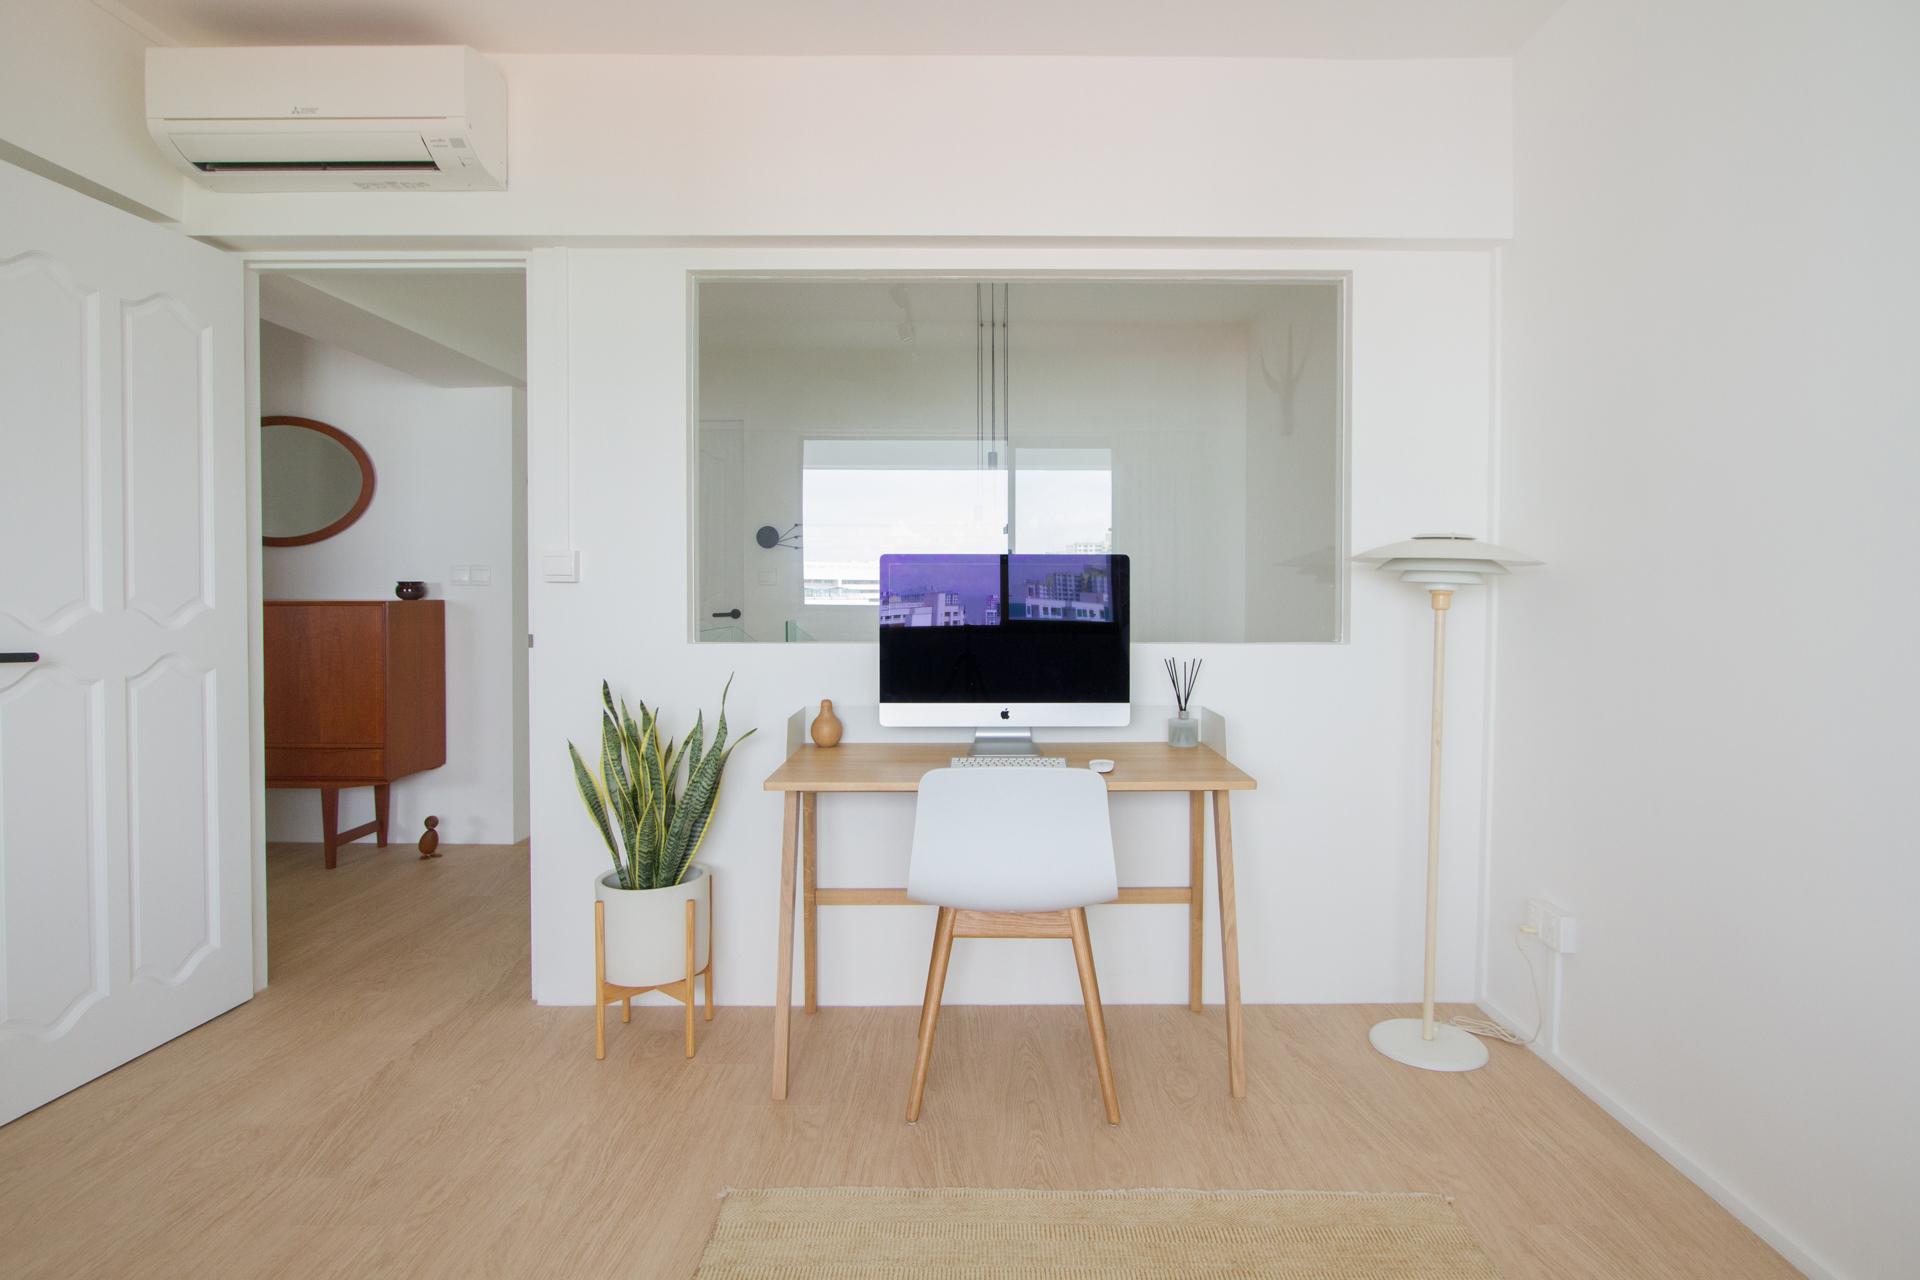 squarerooms-the-merry-men-interiors-office-white-minimalist-scandinavian-bright-plants-tidy-nice-goals-wood